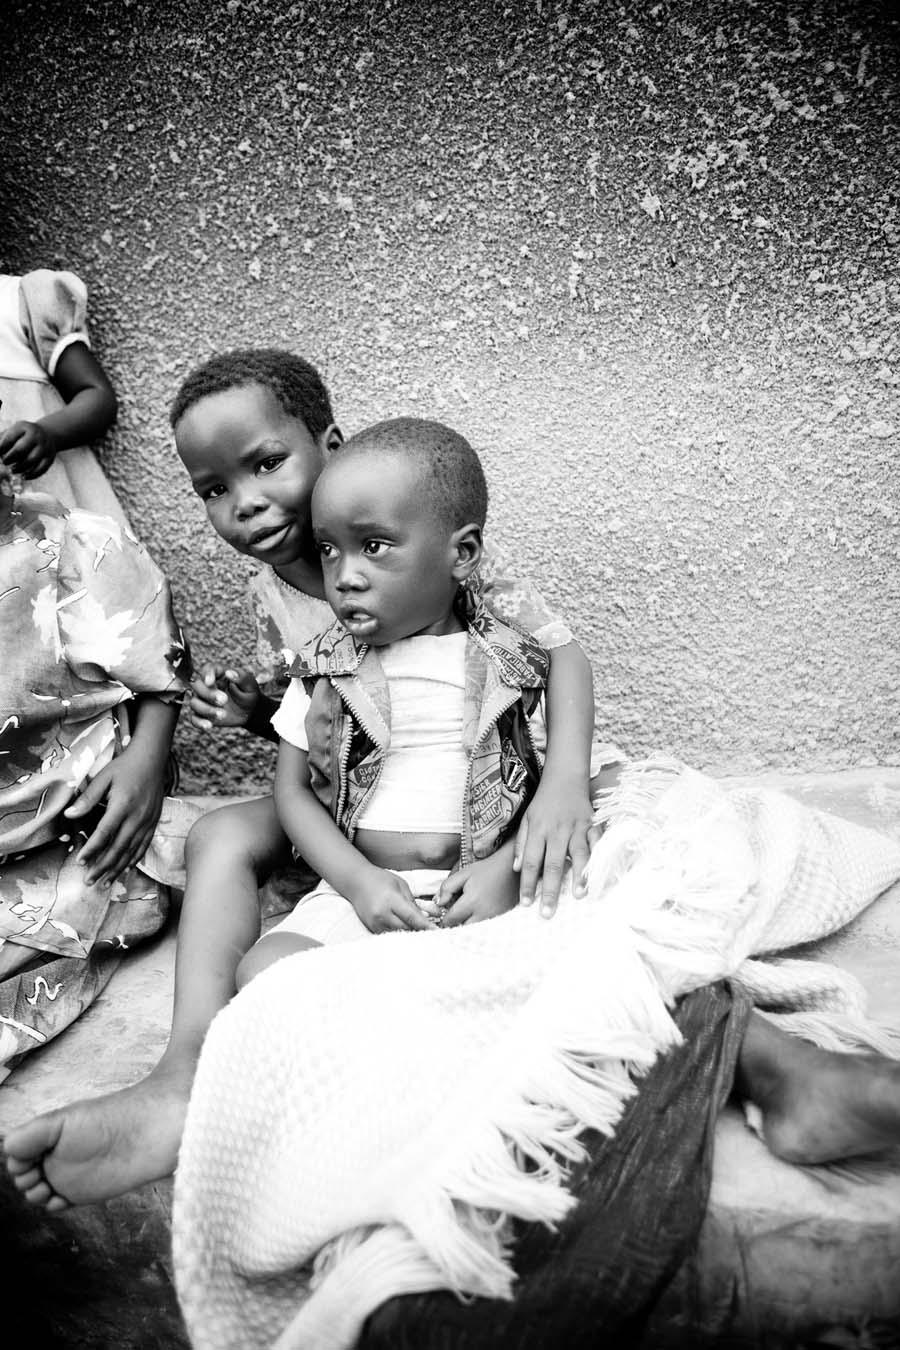 jessicadavisphotography.com | Jessica Davis Photography | Portrait Work in Uganda| Travel Photographer | World Event Photographs 1 (1).jpg